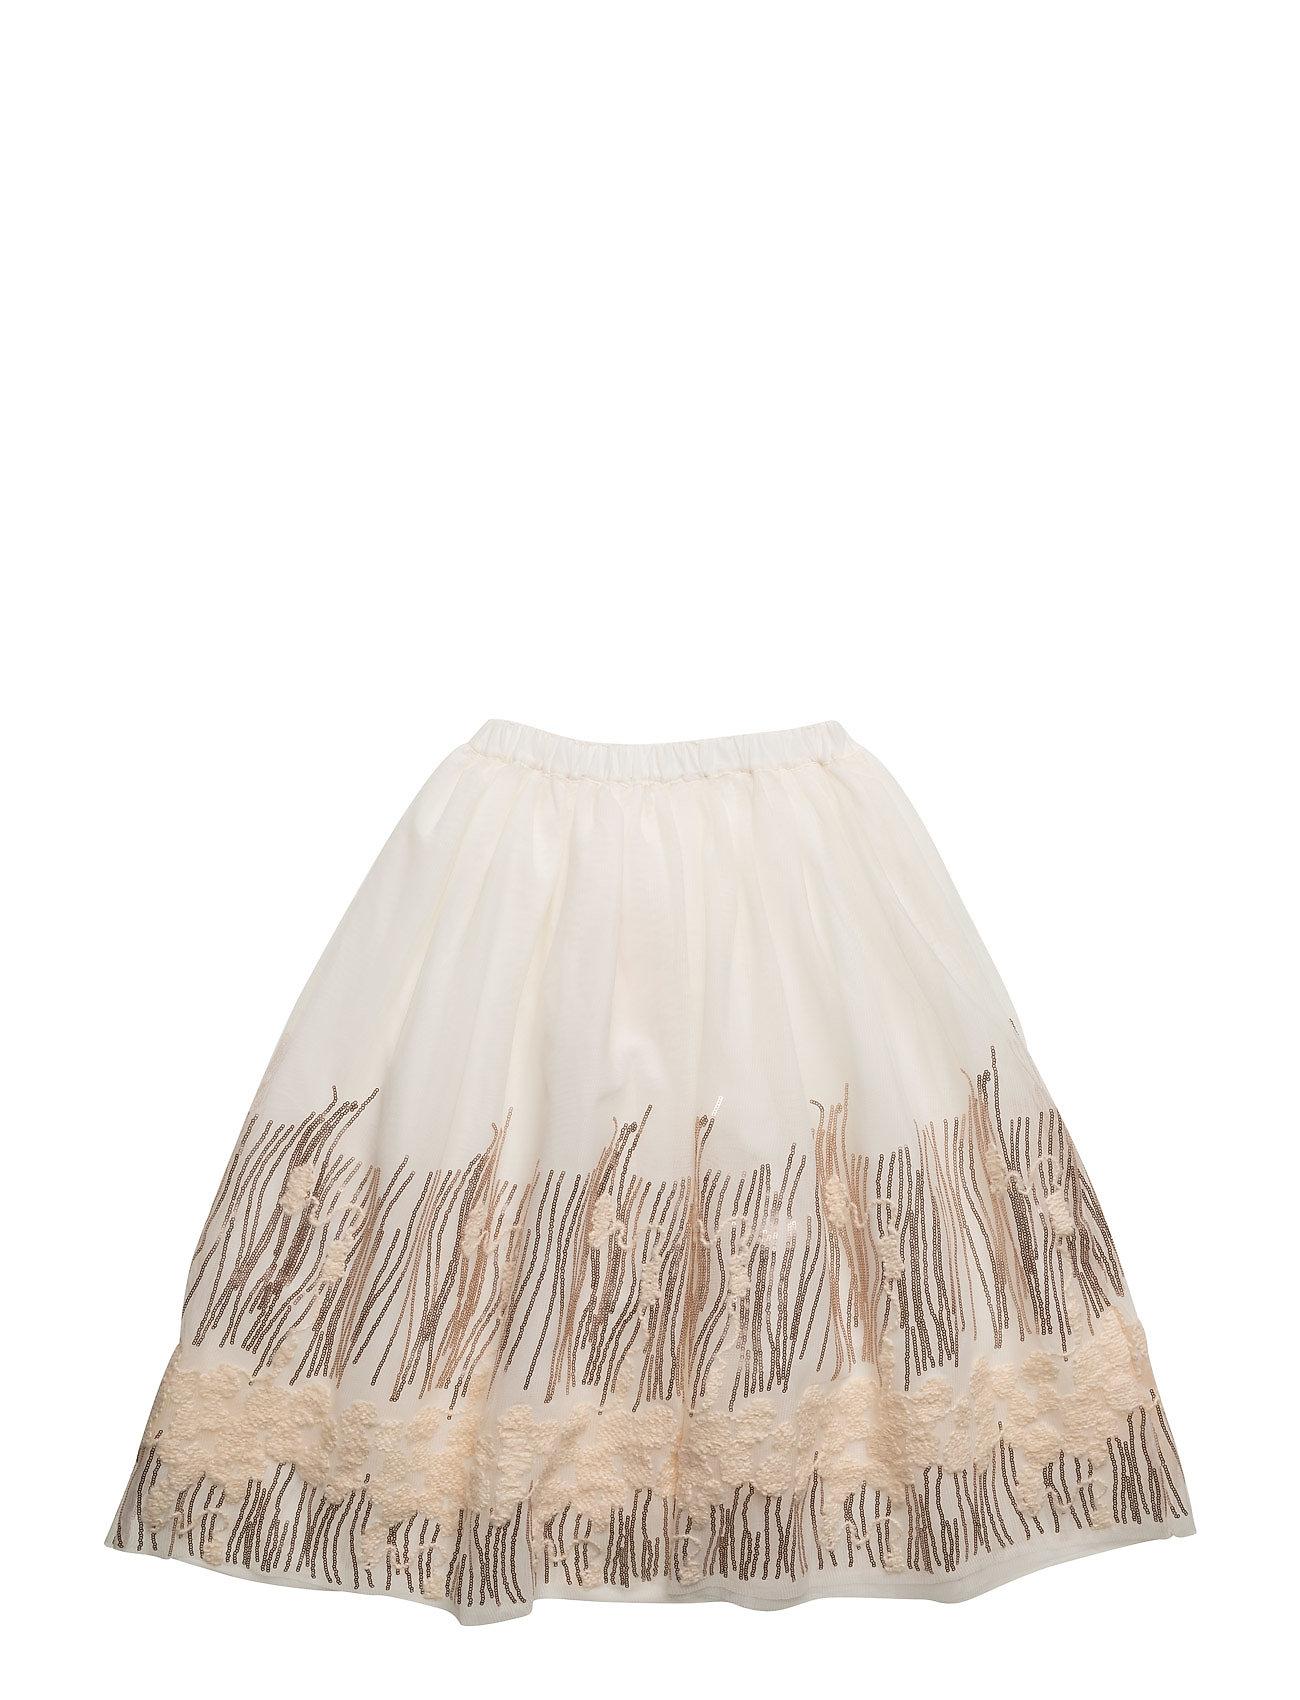 Petticoat Billieblush Kjoler & Nederdele til Piger i hvid